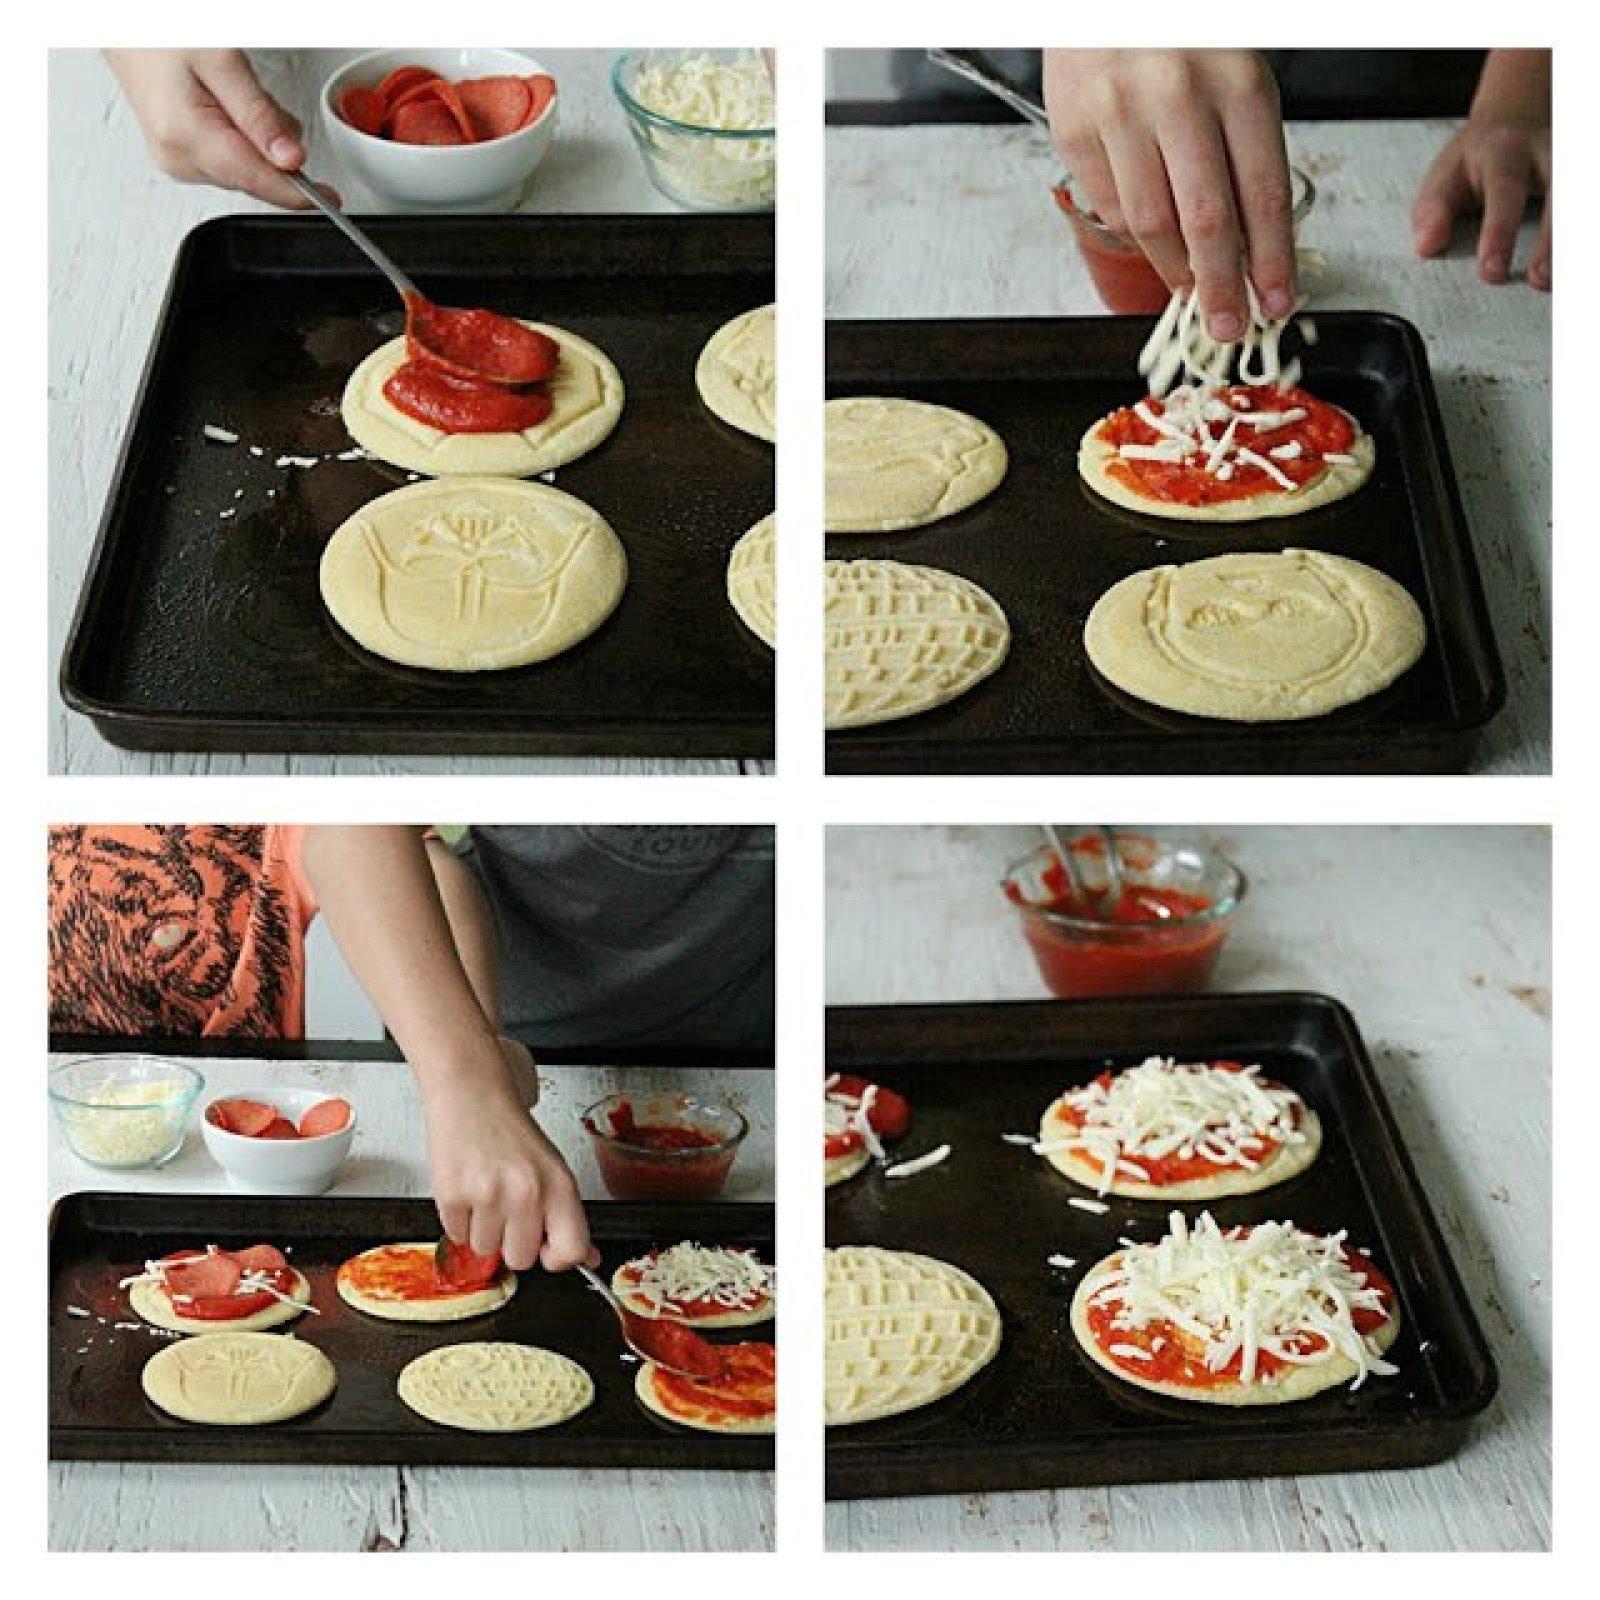 Kid Friendly Mini Pizza Pancakes from Table for Seven: #ad #collectivebias #leggomyeggo #hearthenews